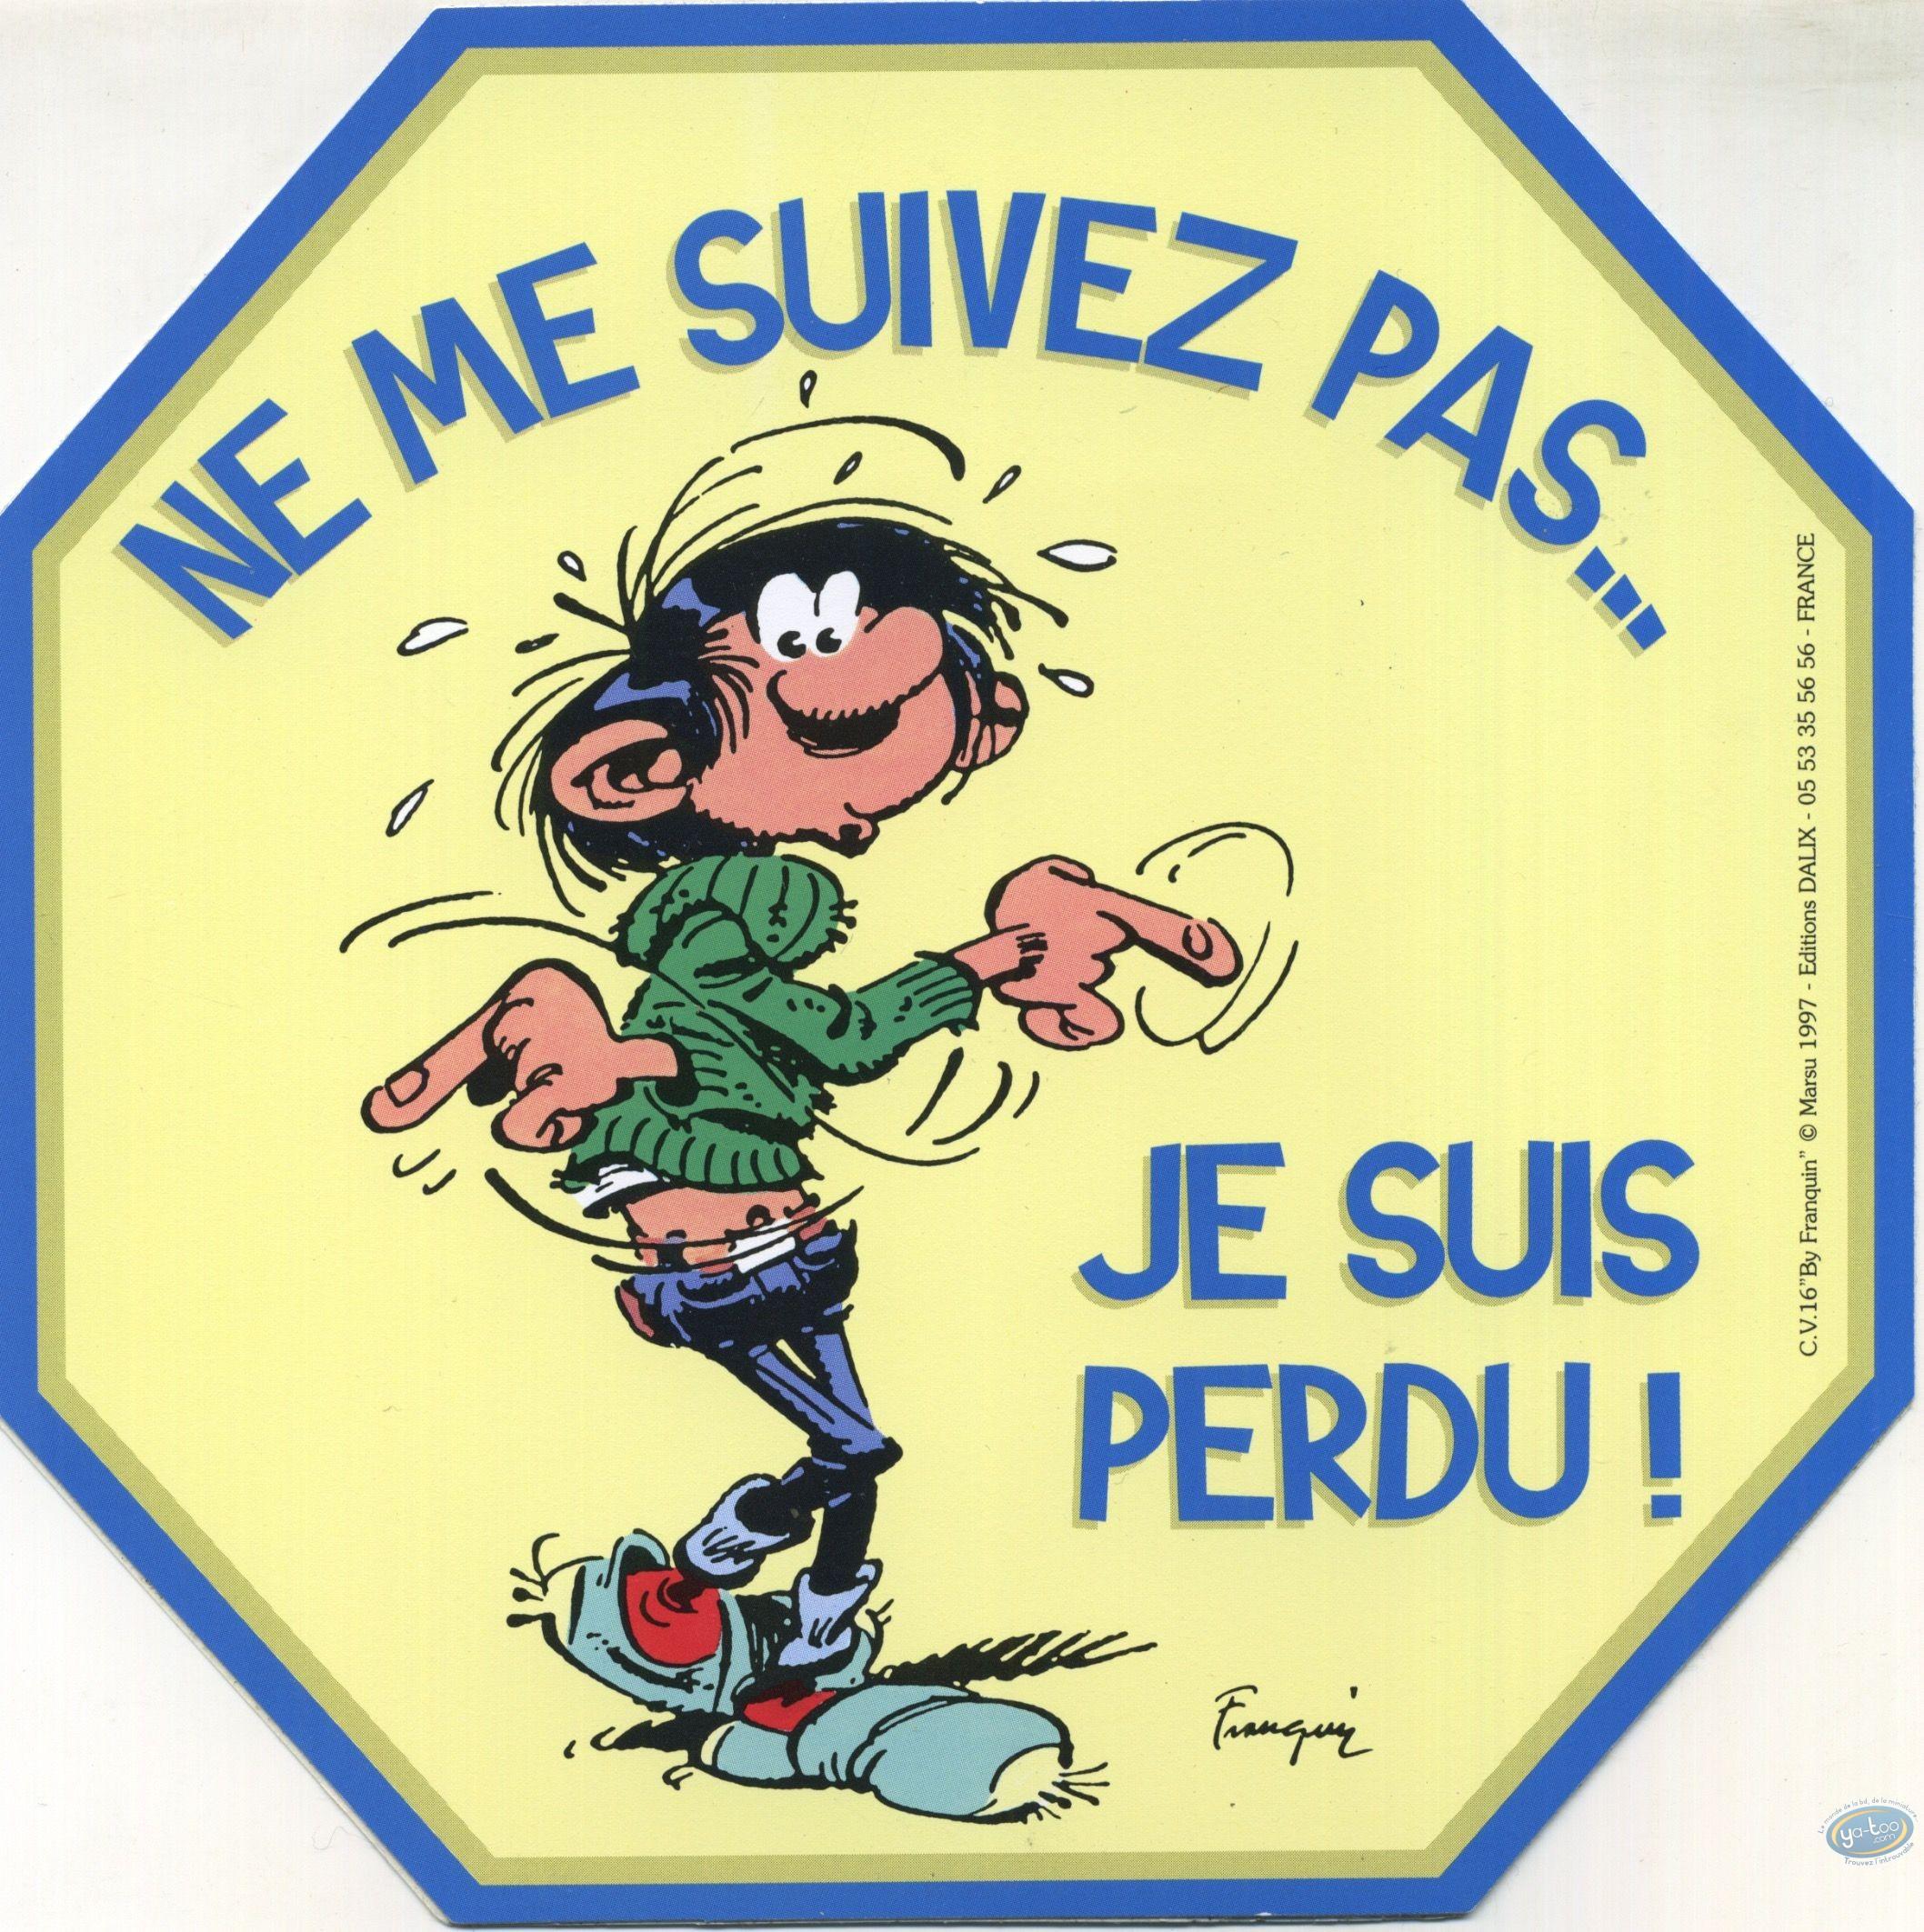 Sticker, Gaston Lagaffe : Don't follow me ... I am lost!